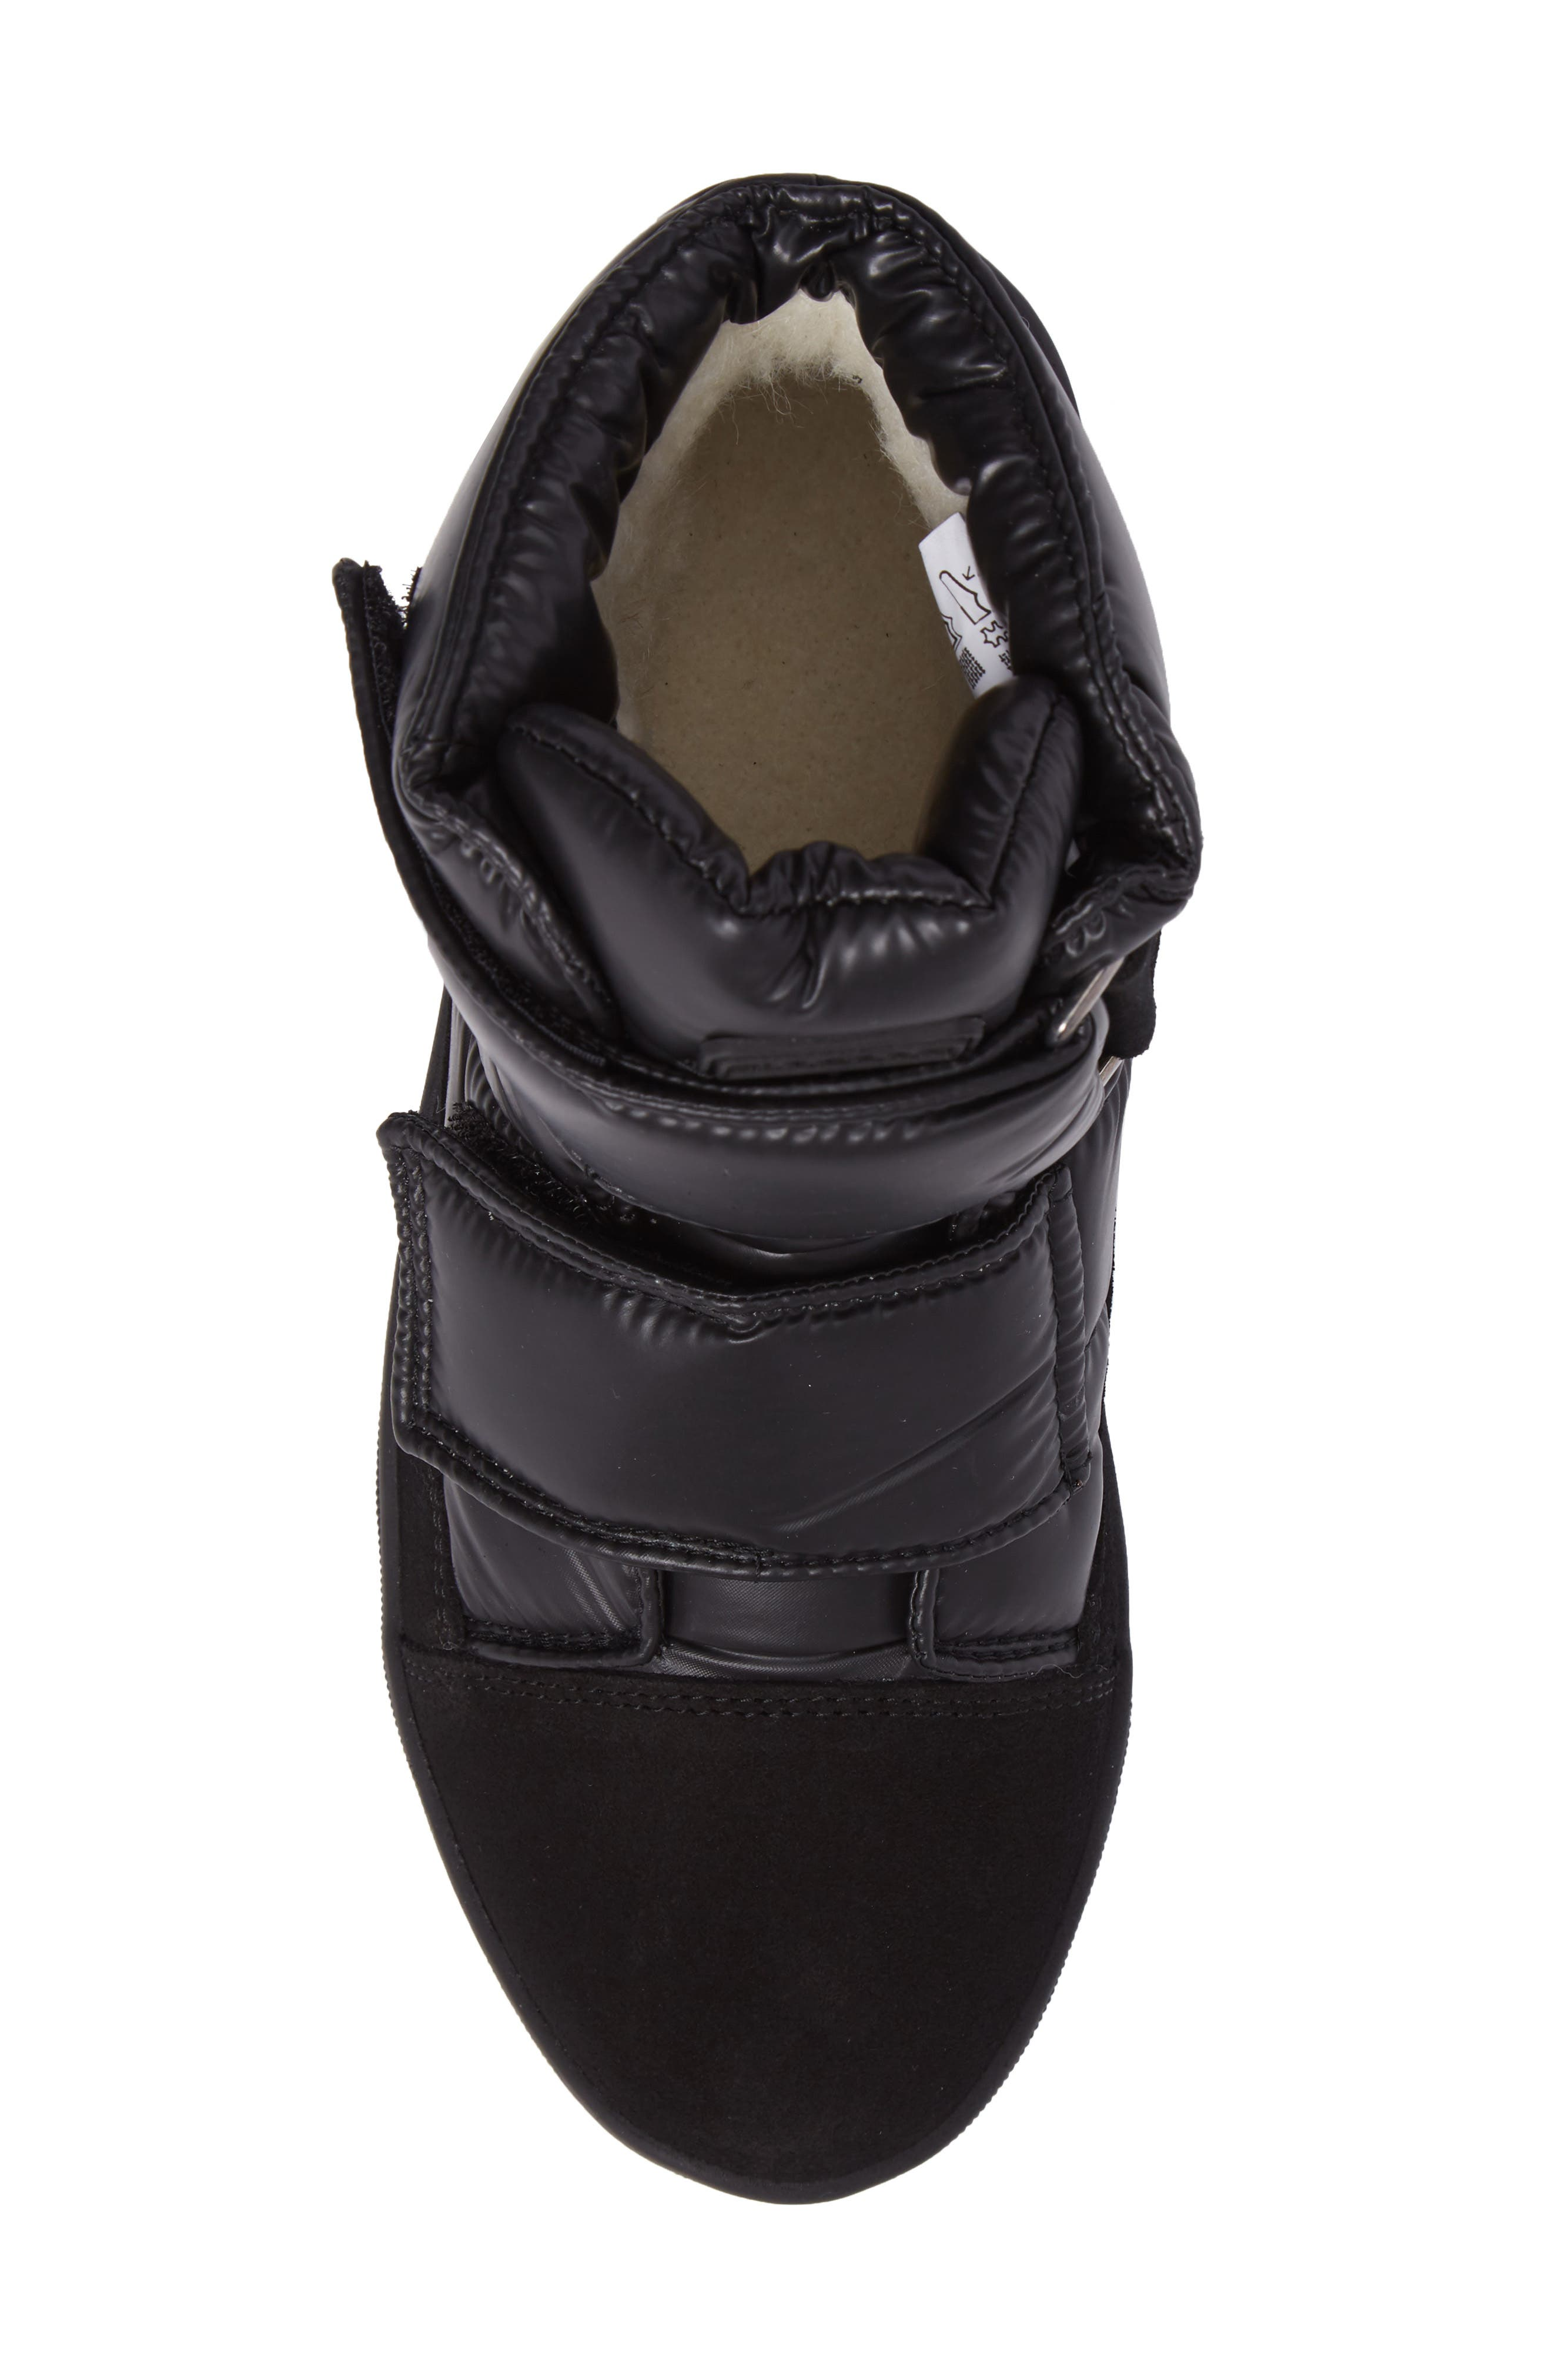 Gran Sasso Waterproof Boot,                             Alternate thumbnail 5, color,                             Black Baltico